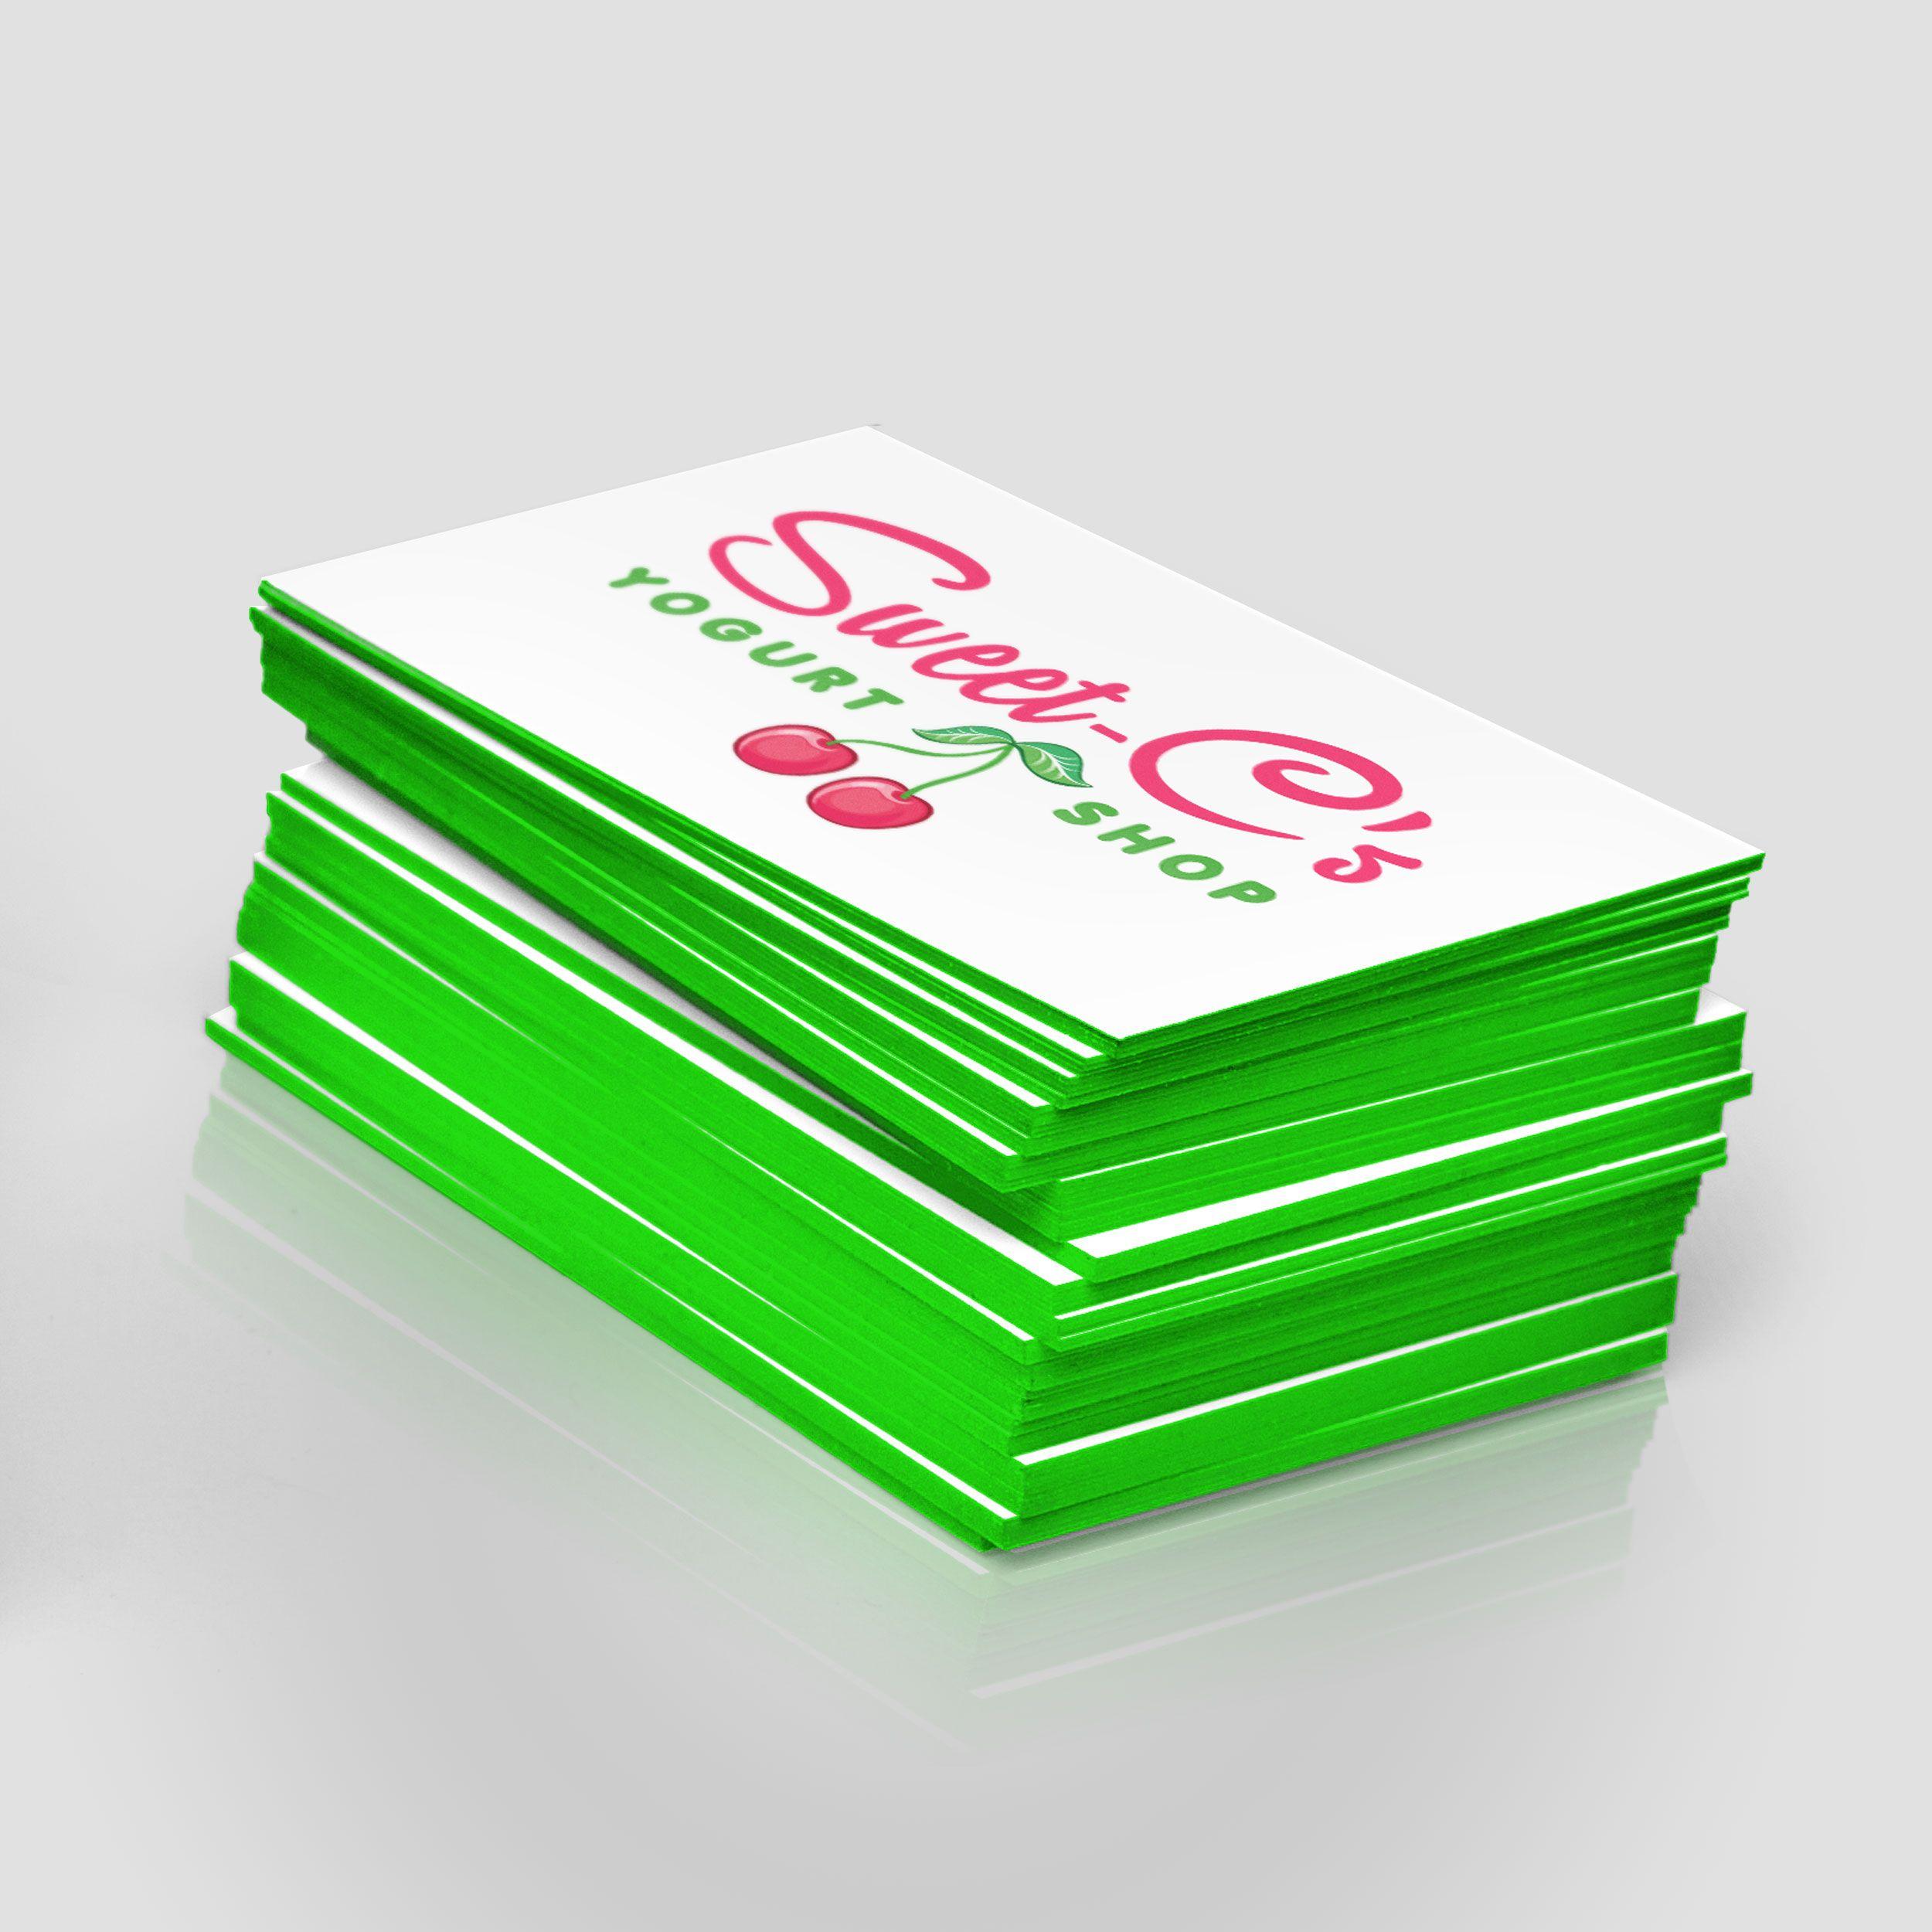 Painted edge business cards jakprints inc layout and portfolio painted edge business cards jakprints inc colourmoves